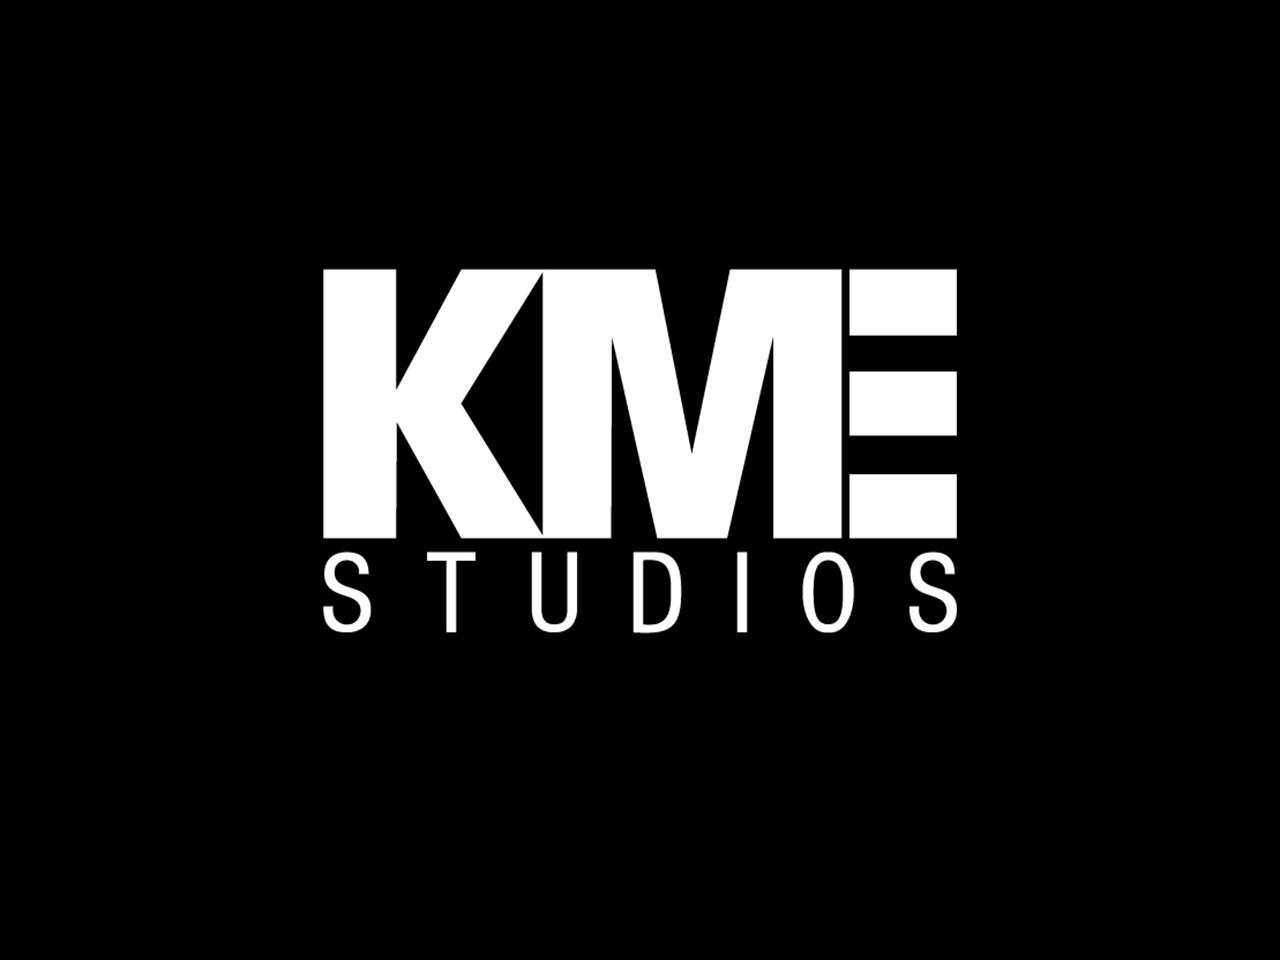 fotoproduktion-werbung-kme-studios